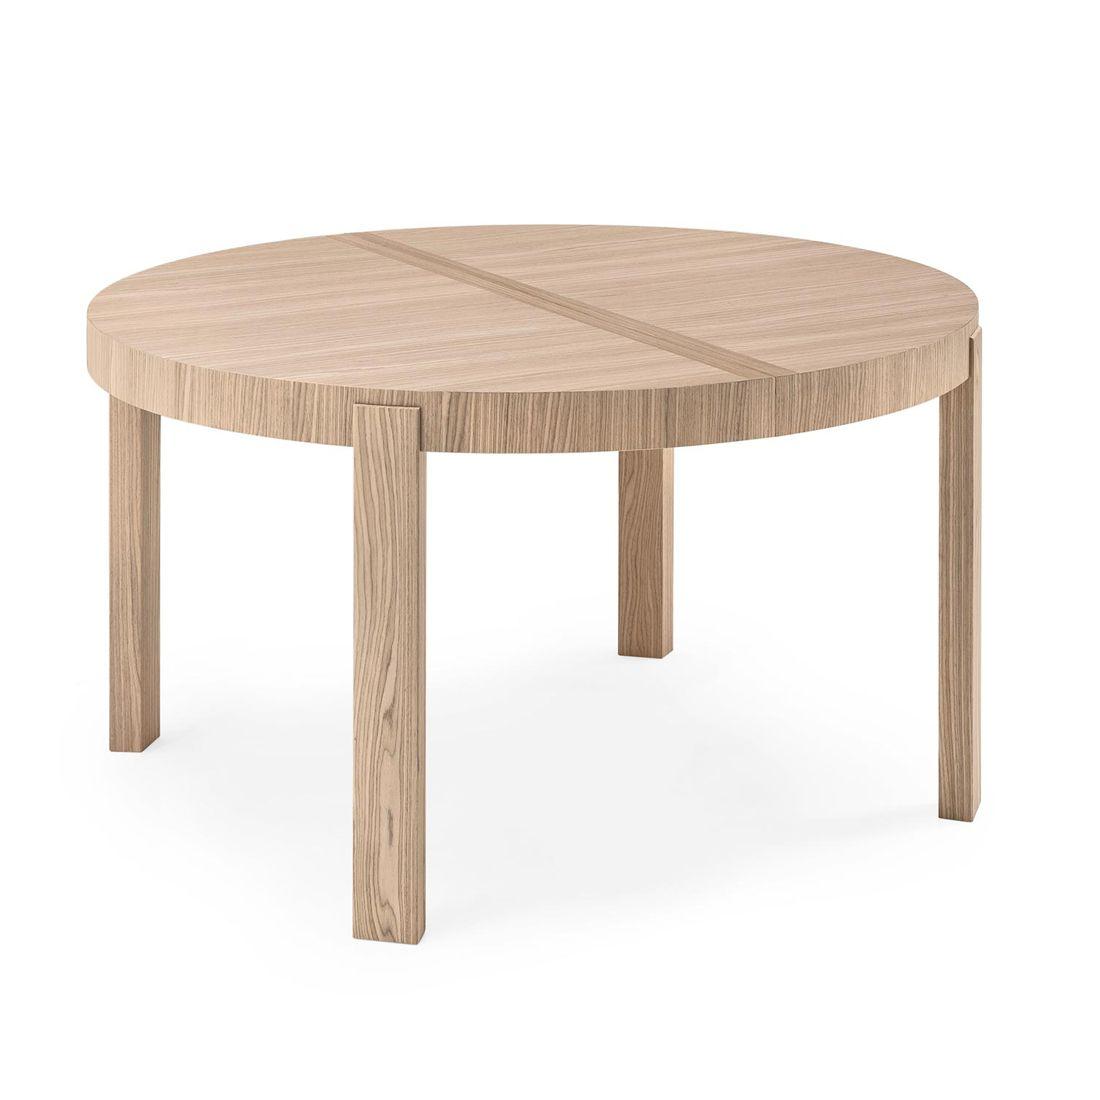 Table de repas ronde extensible Atelier … | Pinteres…